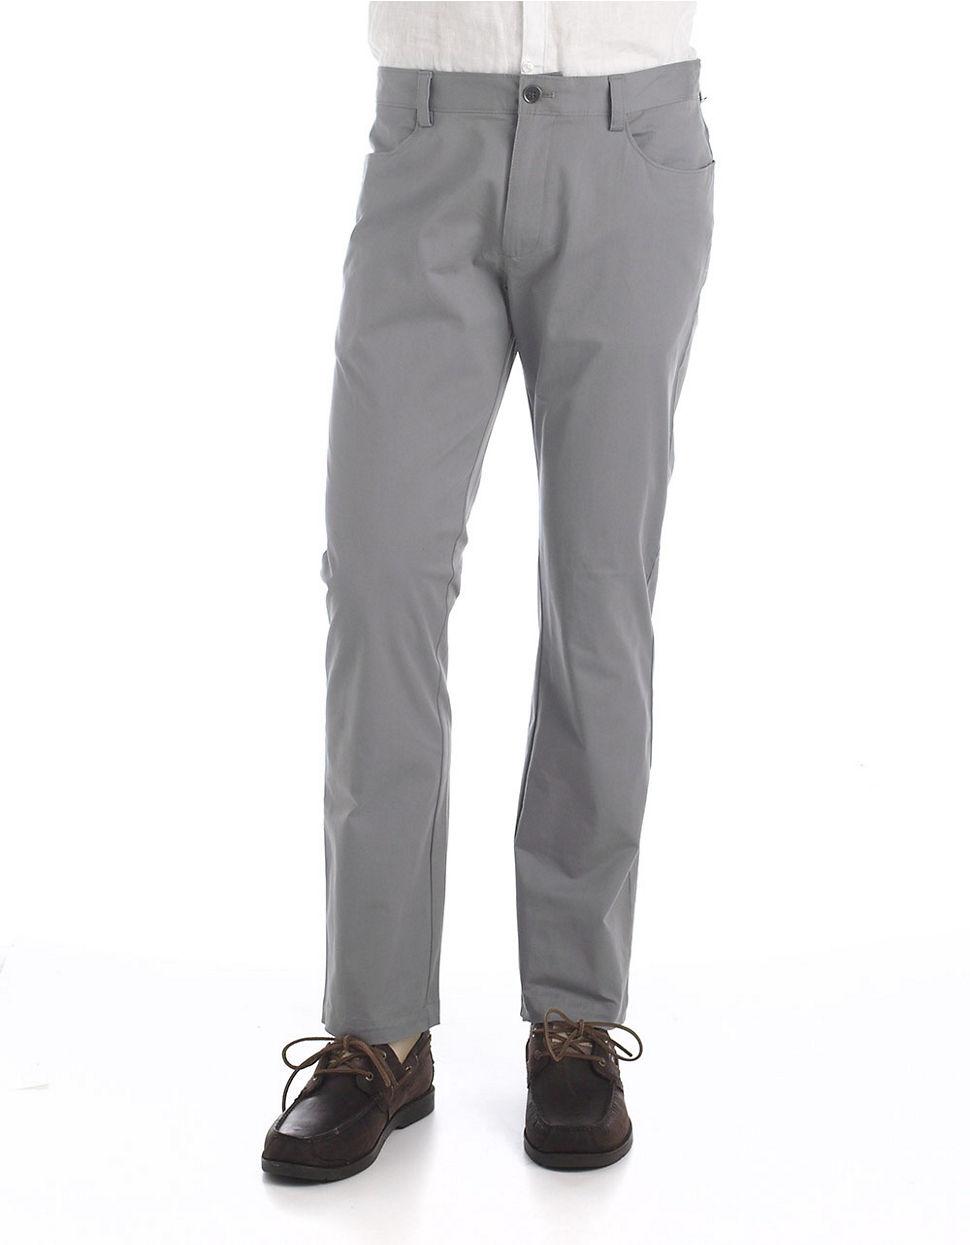 Calvin klein slim fit stretch pants in gray for men for Calvin klein slim fit stretch shirt